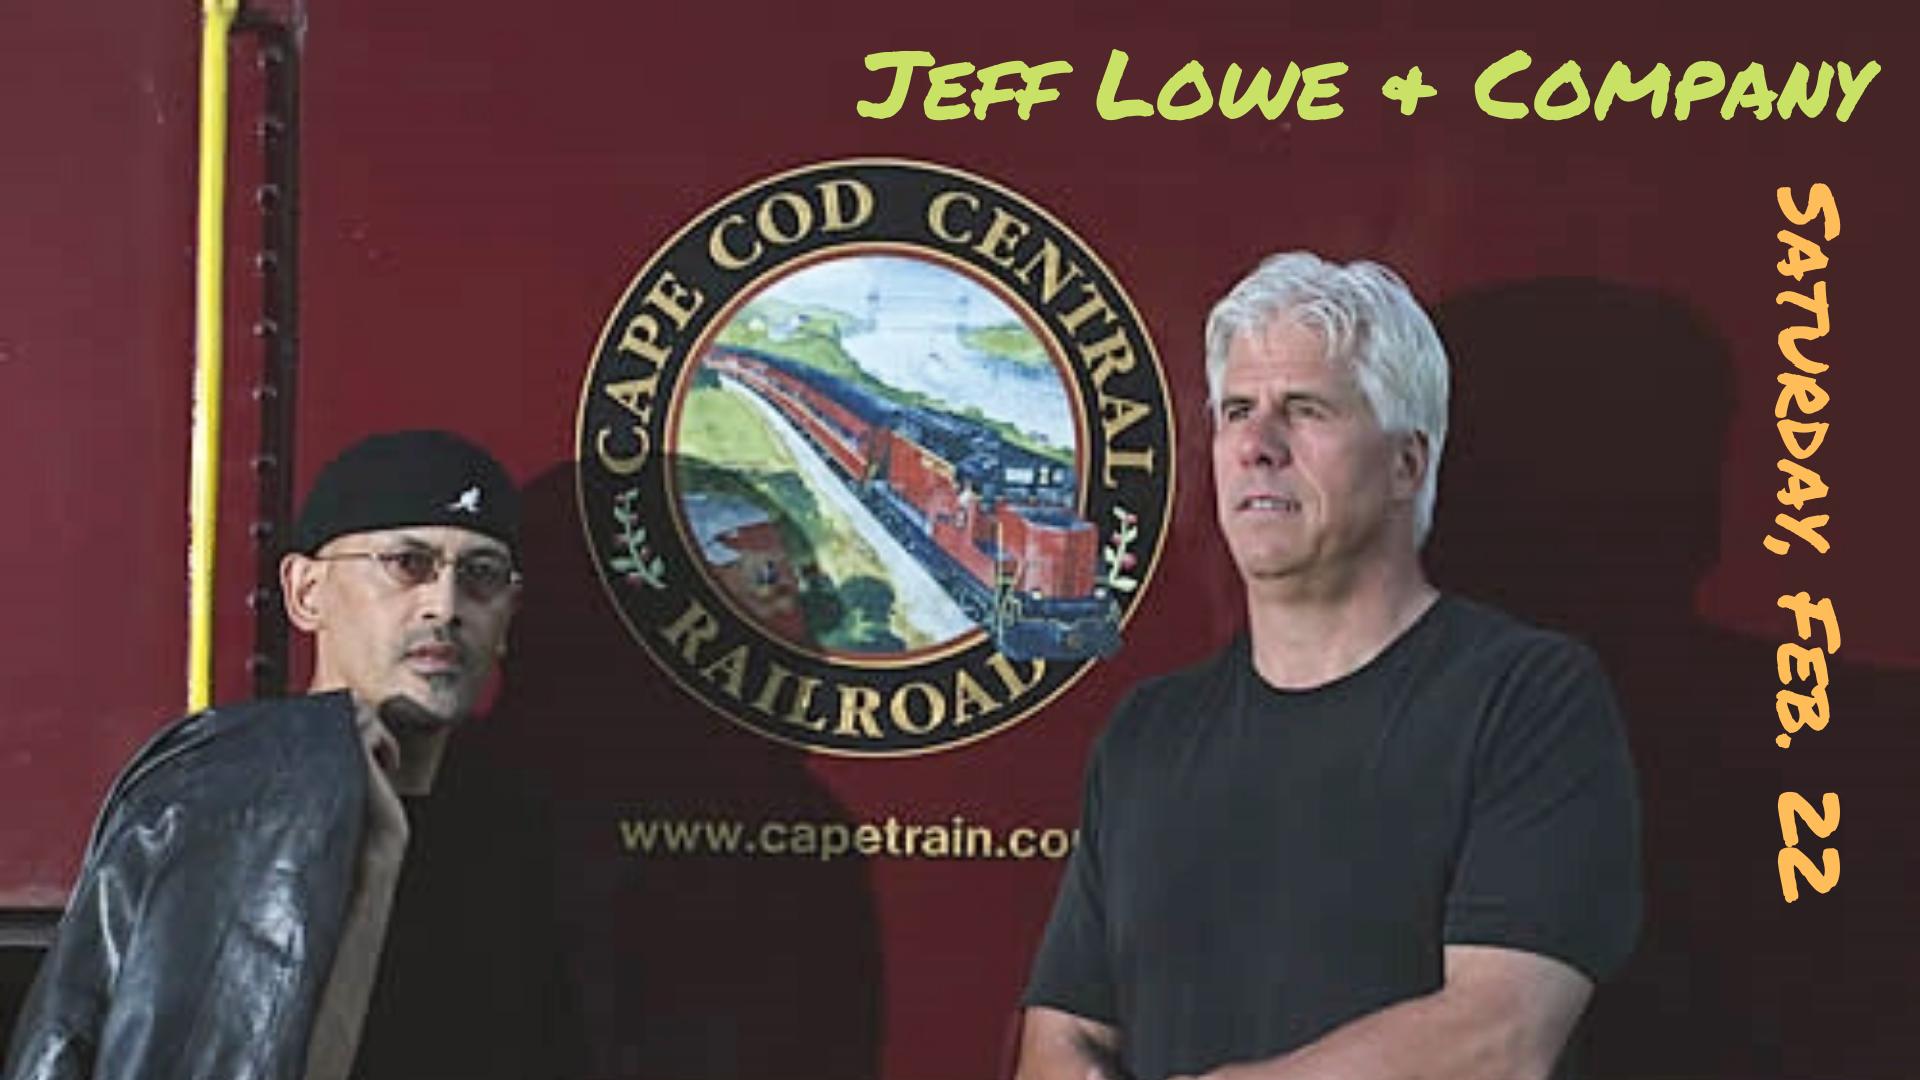 Jeff Lowe & Company